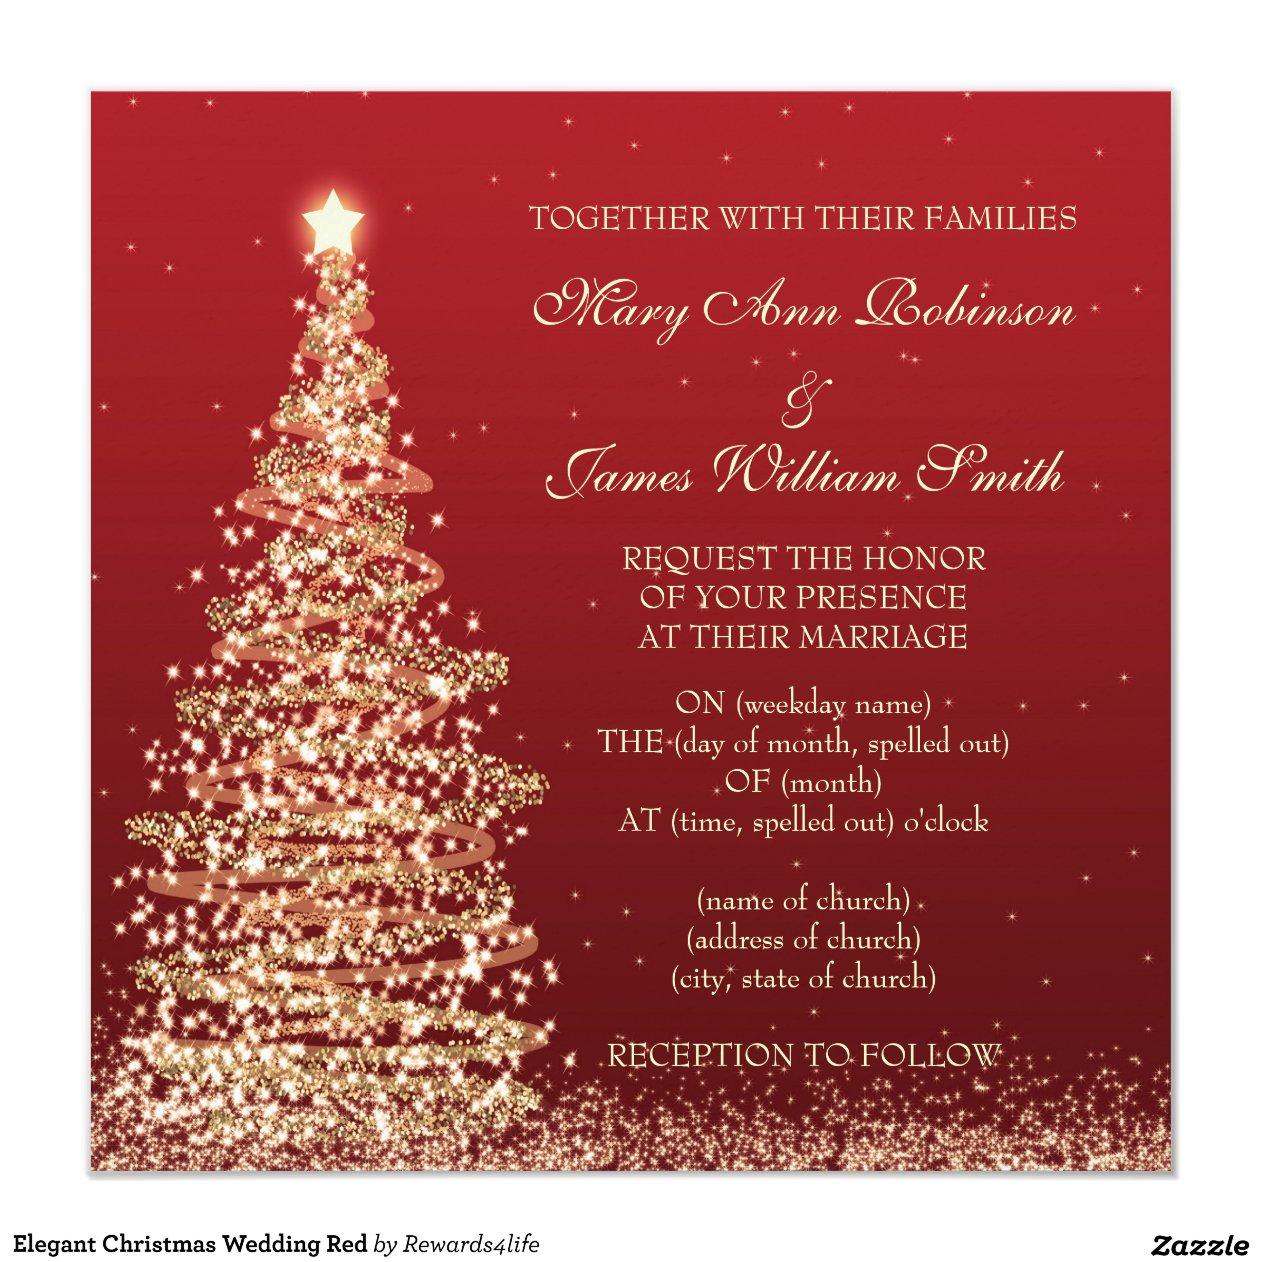 Wedding Invitations Elegant for beautiful invitations layout